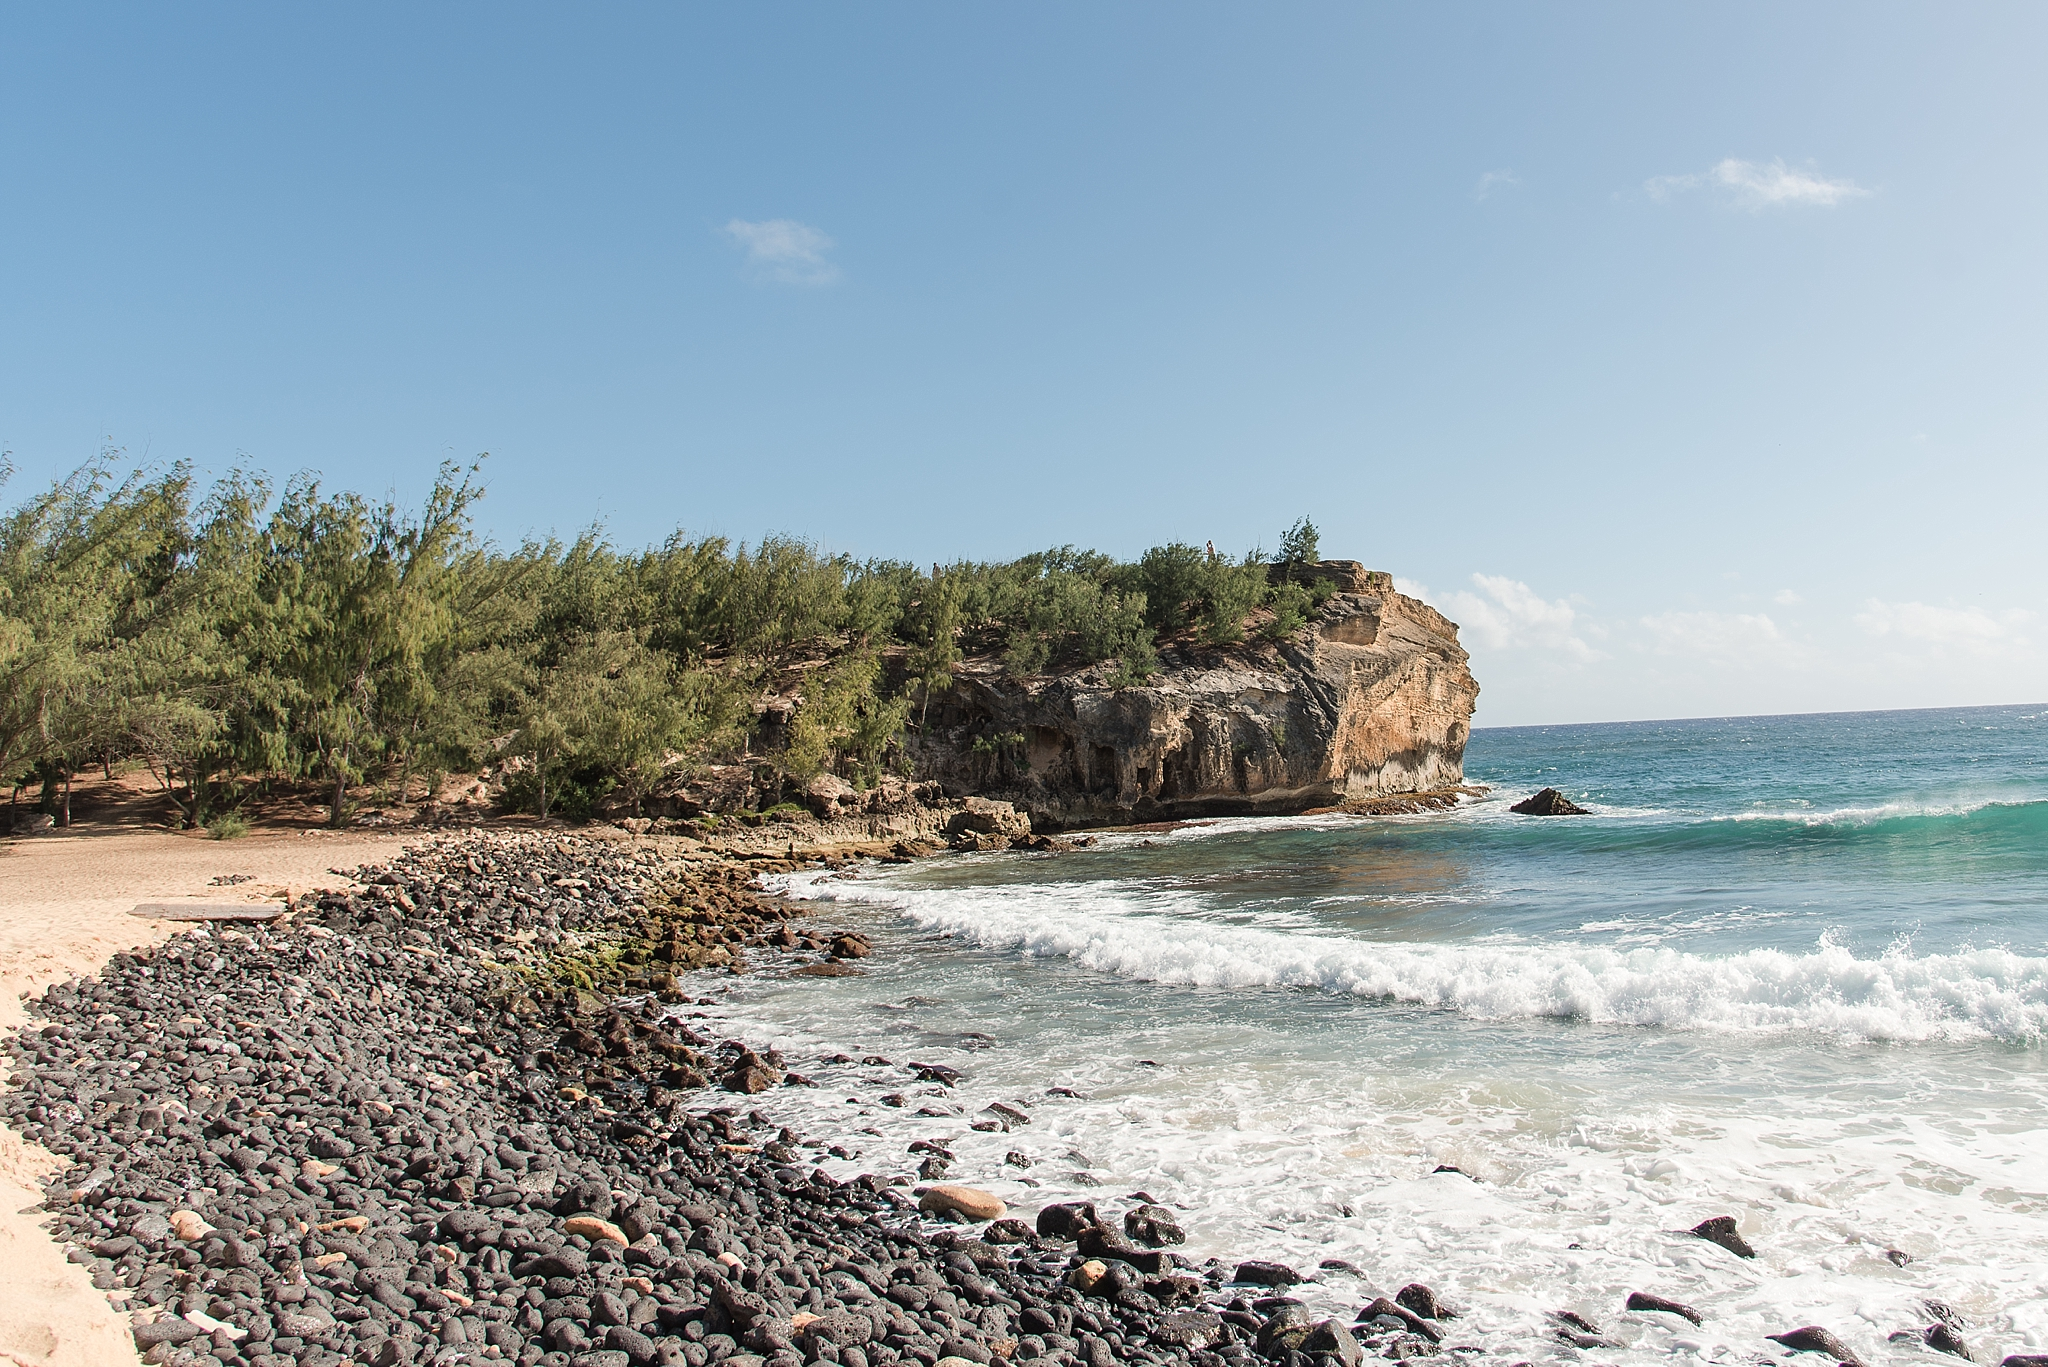 Shipwreck Beach in Poipu, Kaua'i Hawai'i. Photo by Jade Min Photography.